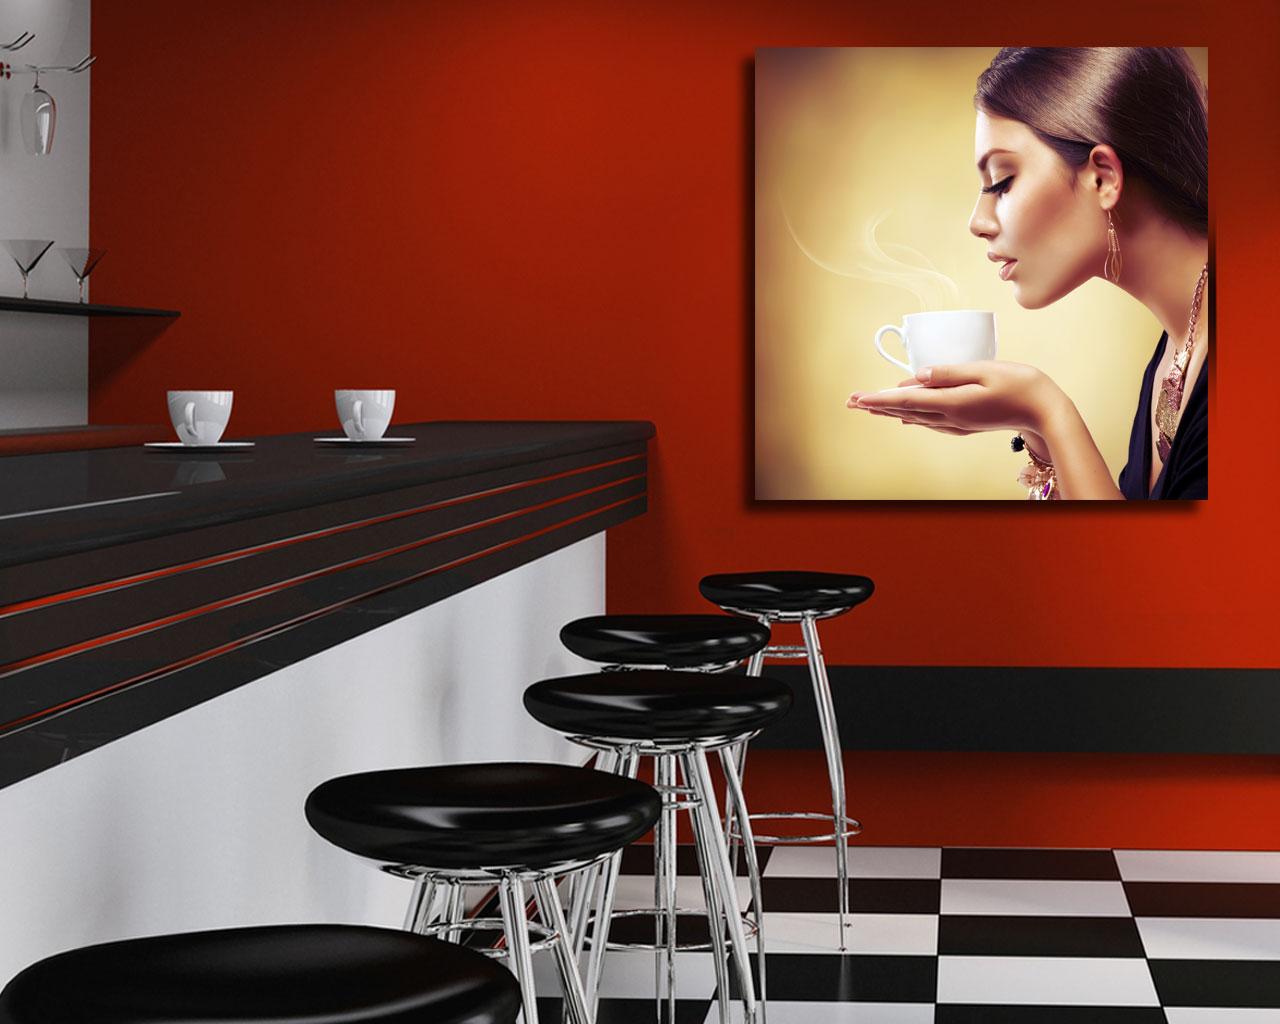 Stampa su tela - piacere di caffe